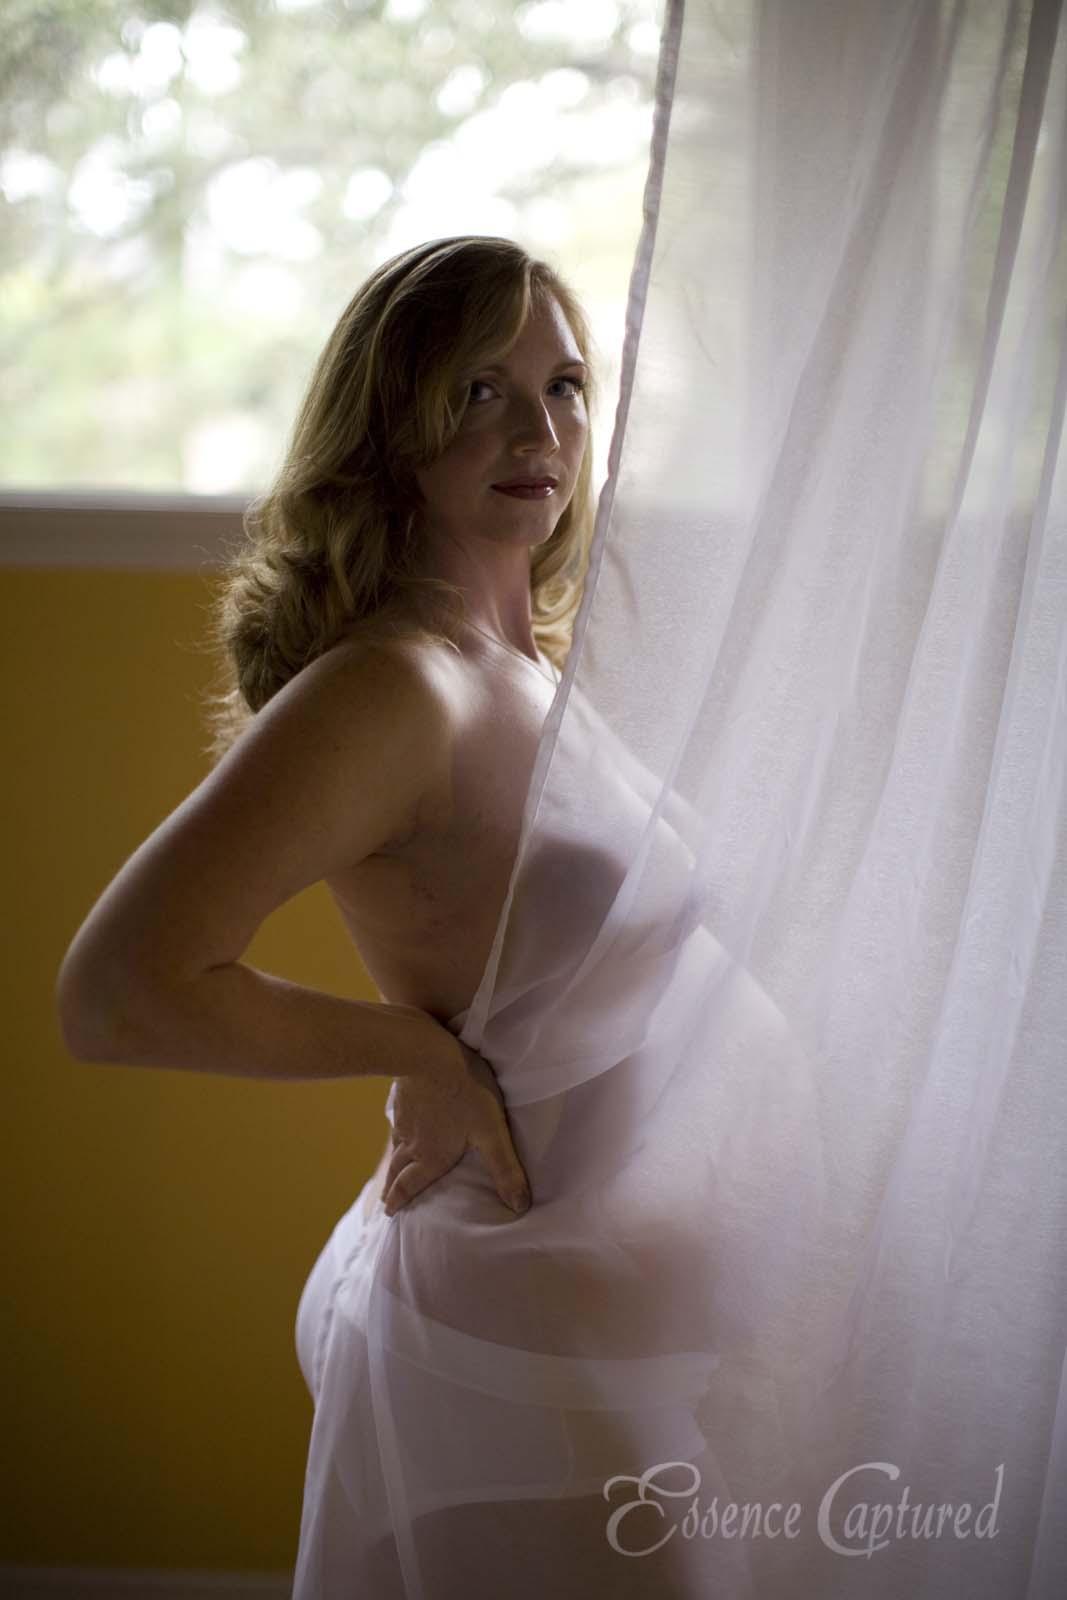 female maternity portrait back-lit sheer curtain